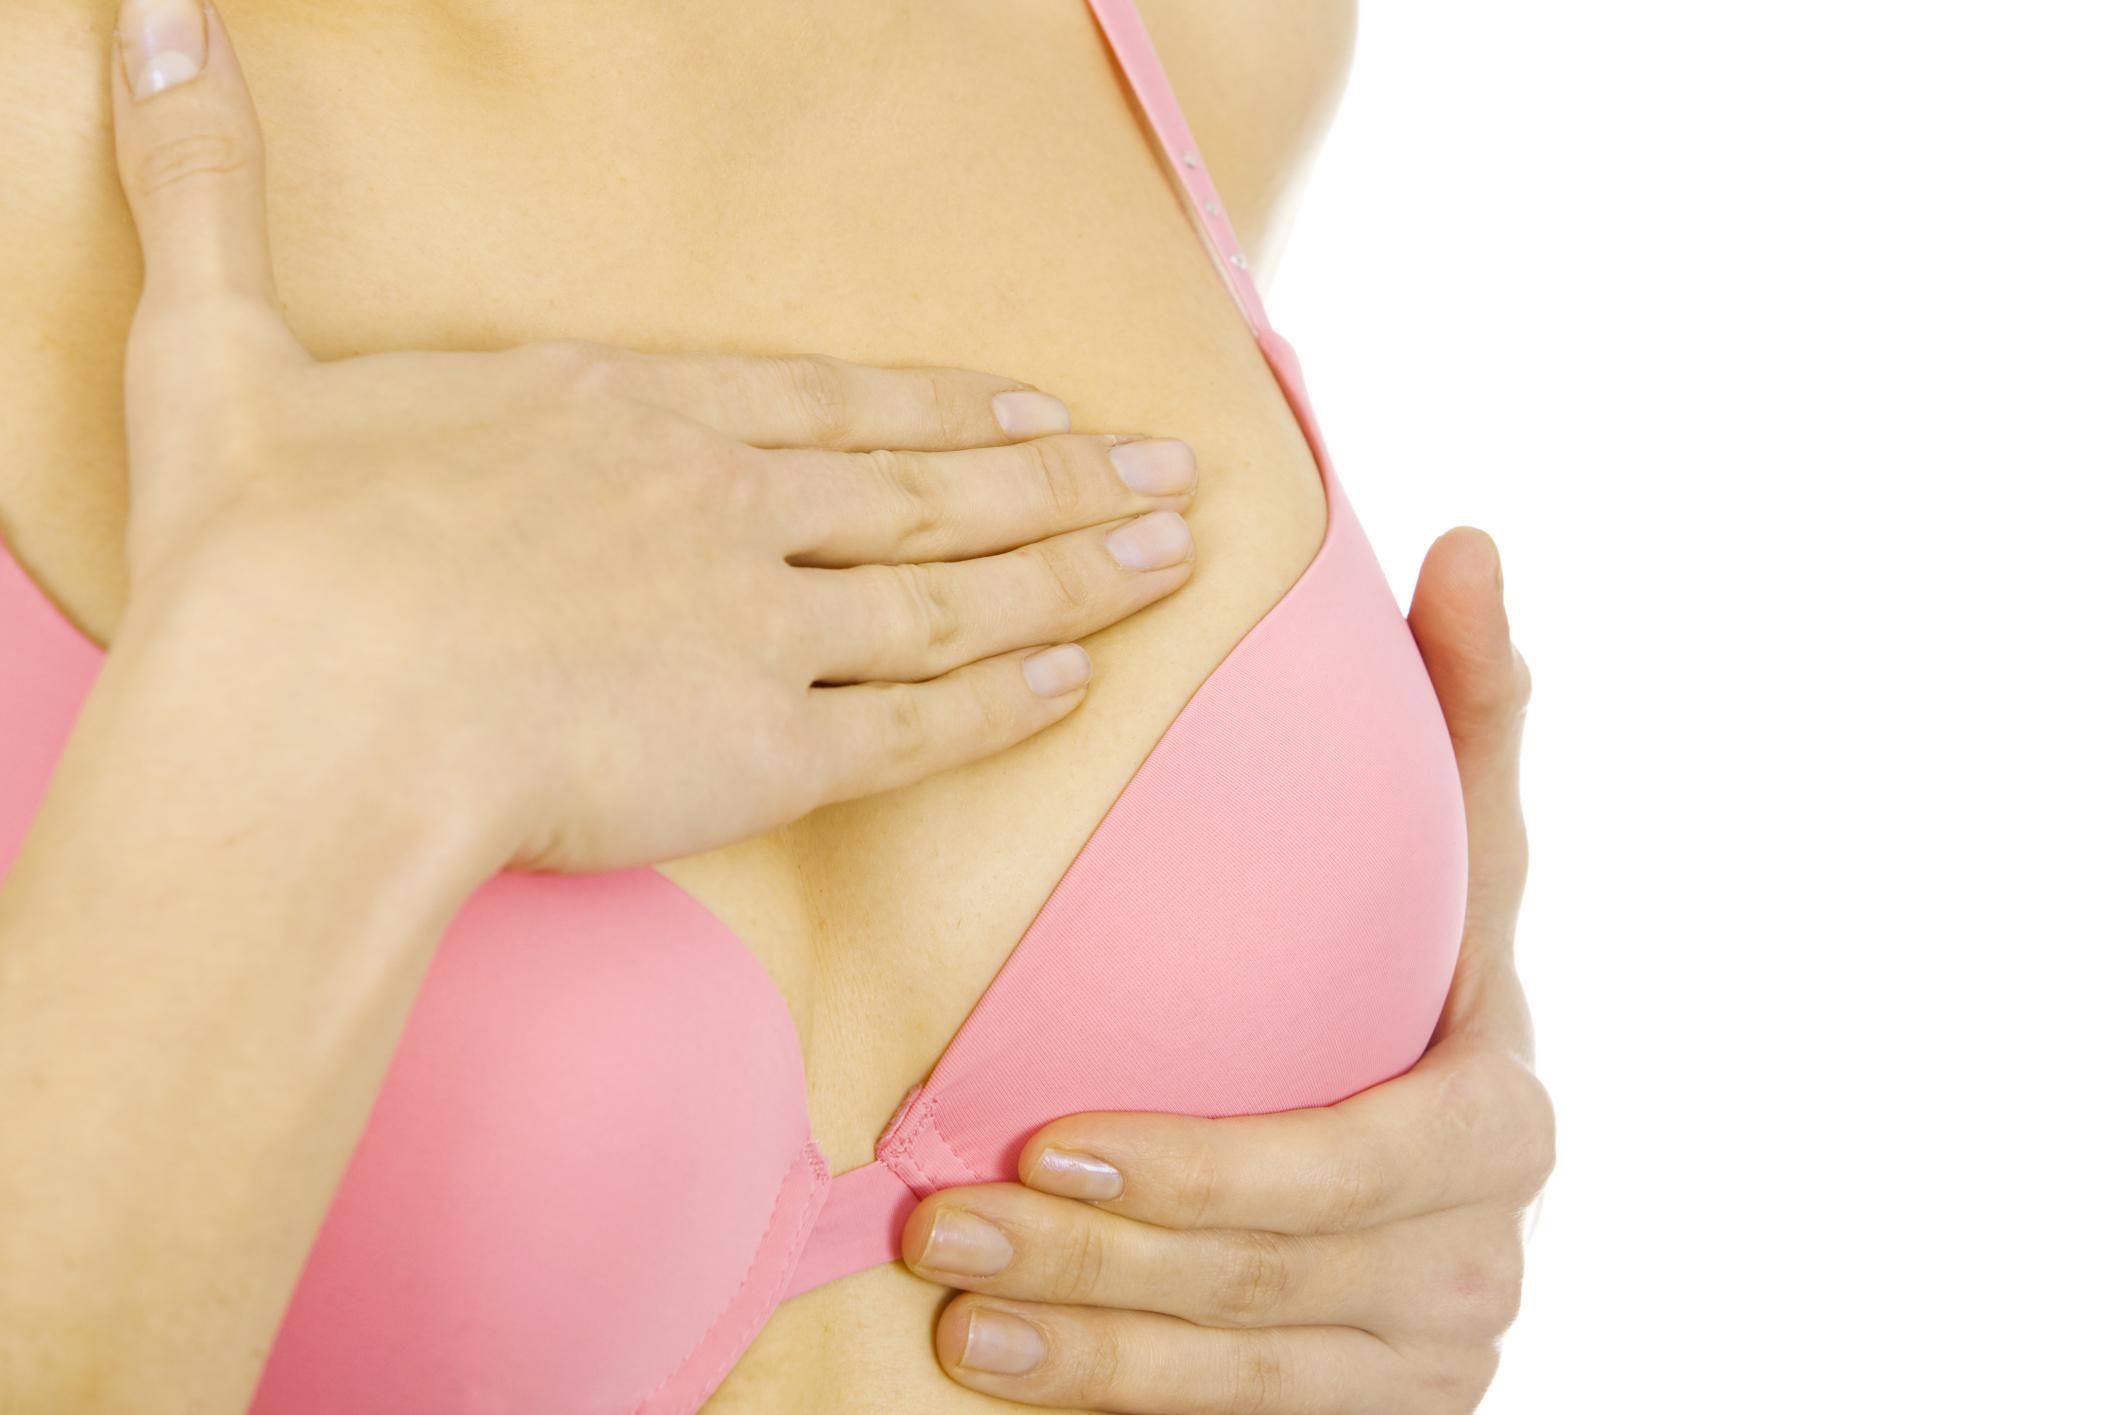 Бородавки на грудине у женщин